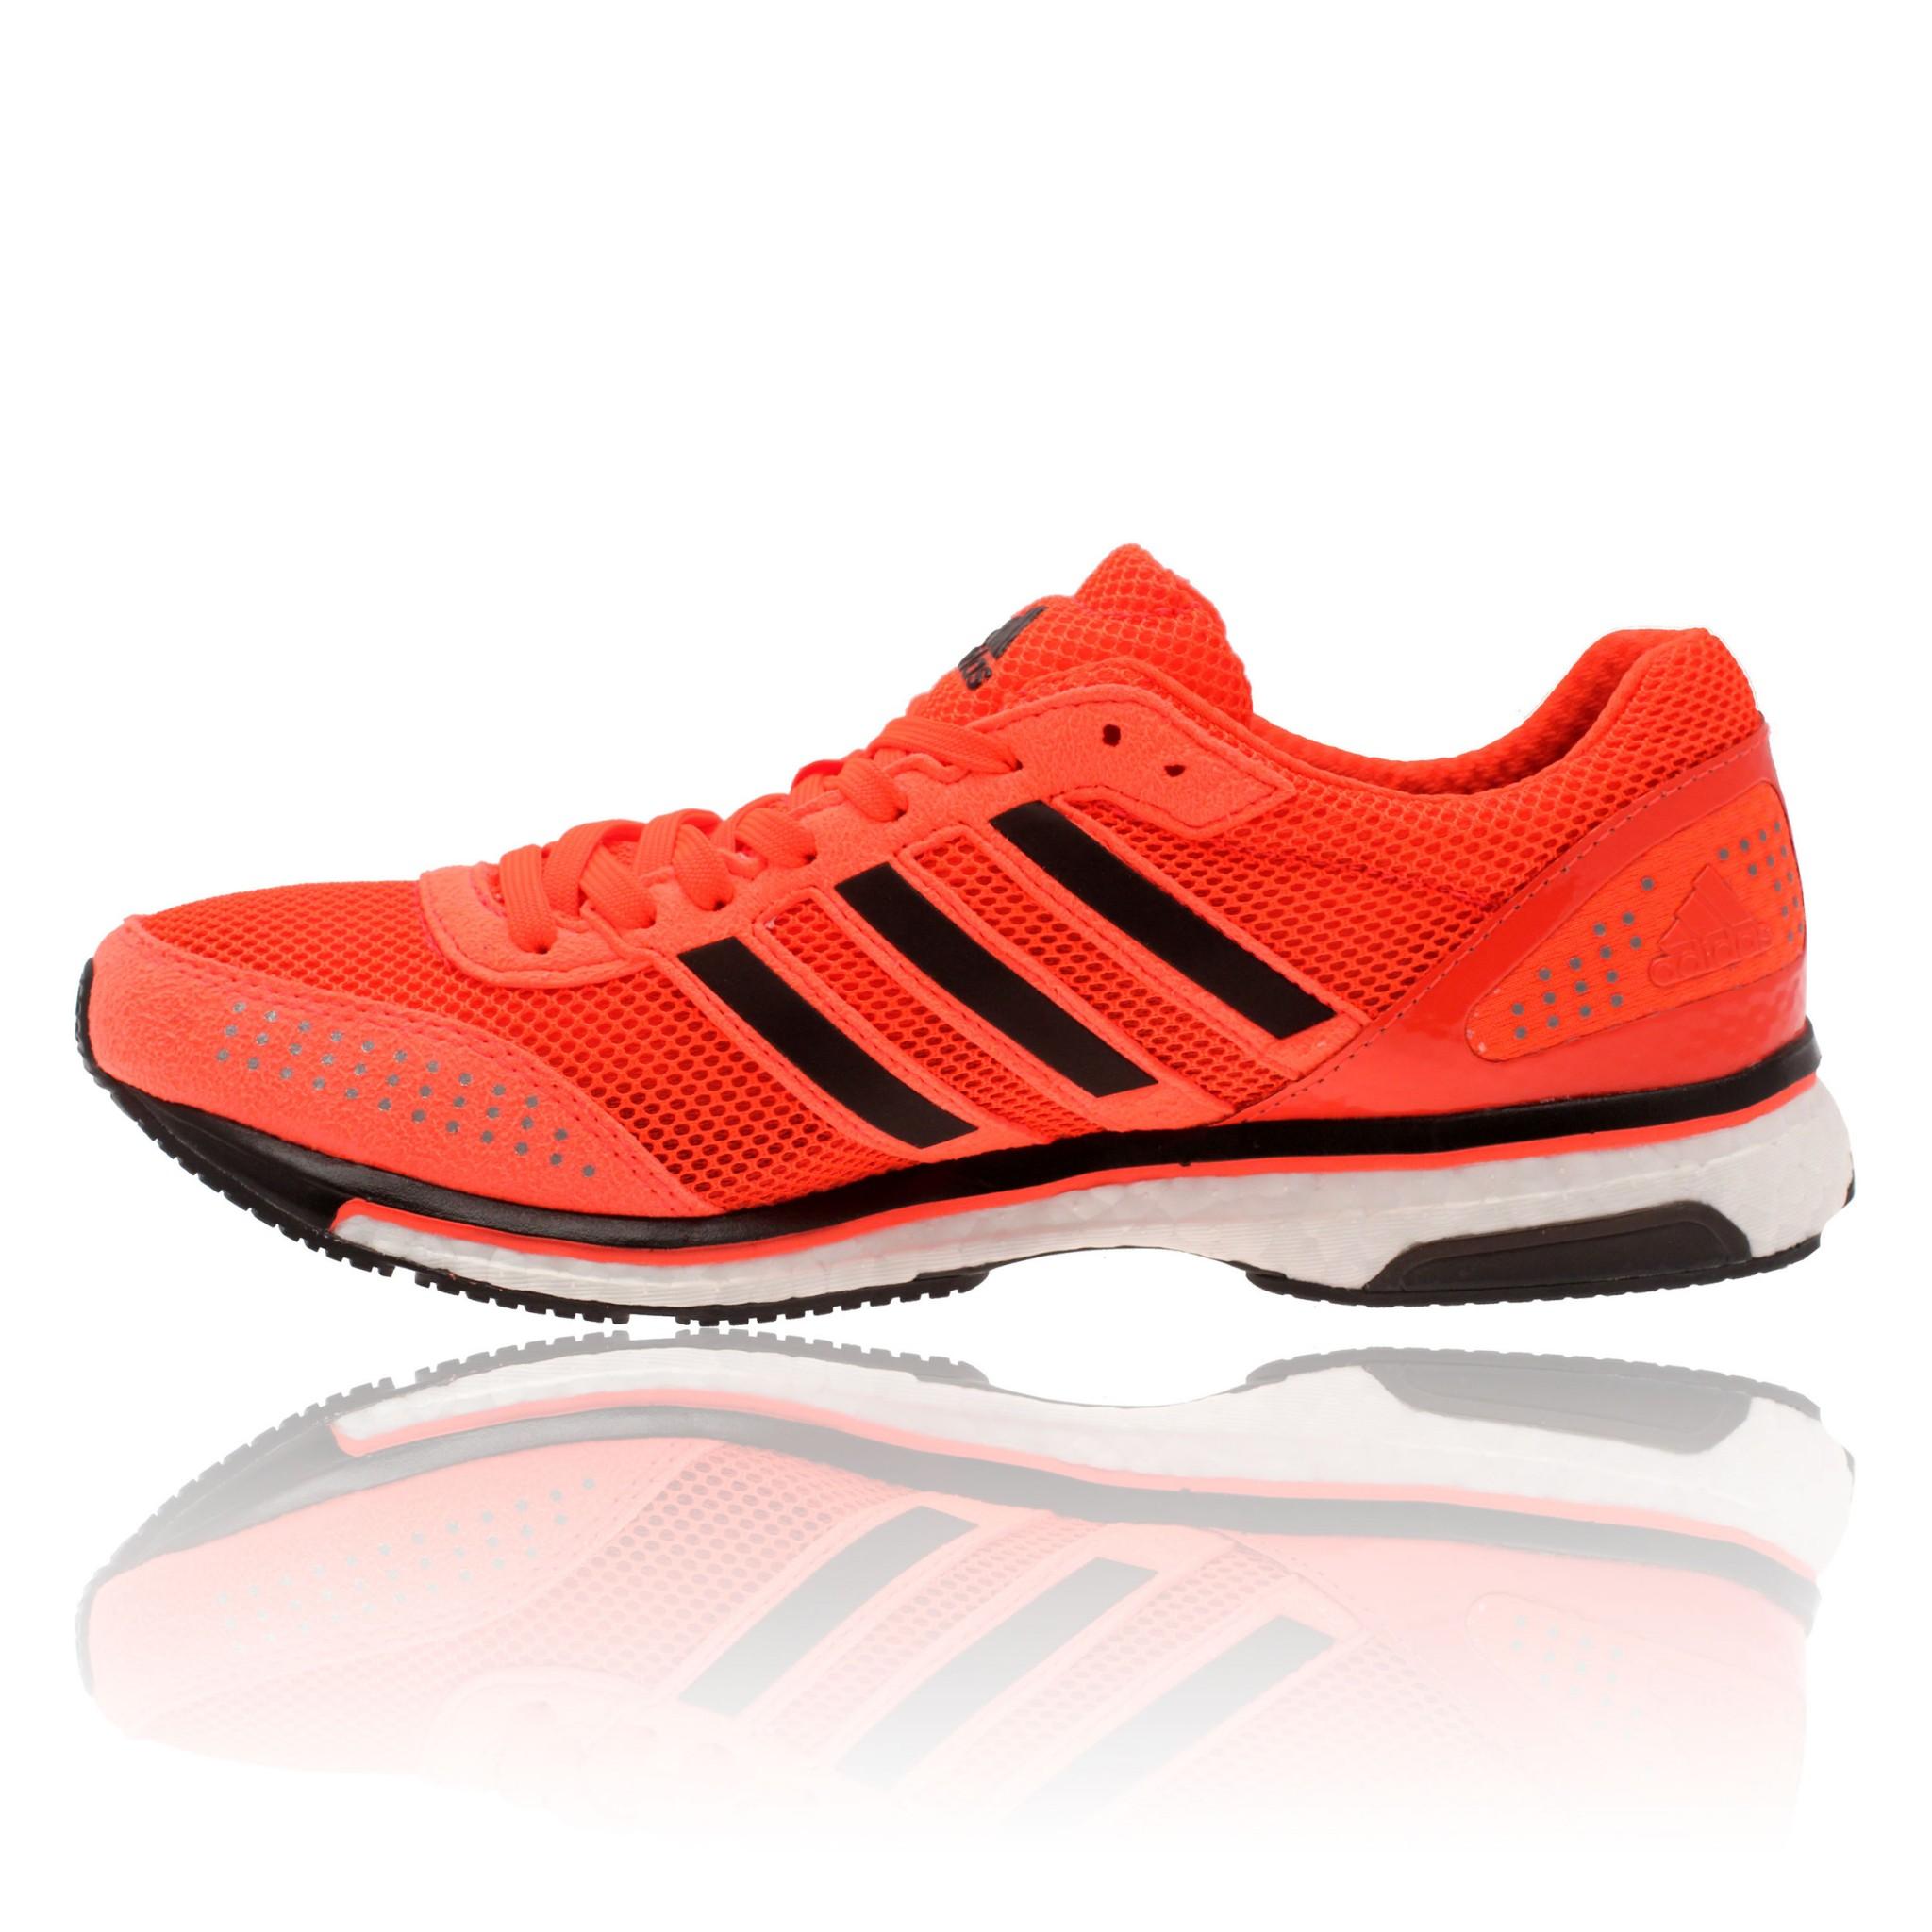 Adidas Adios Boost 2.0, un record du monde sous la semelle